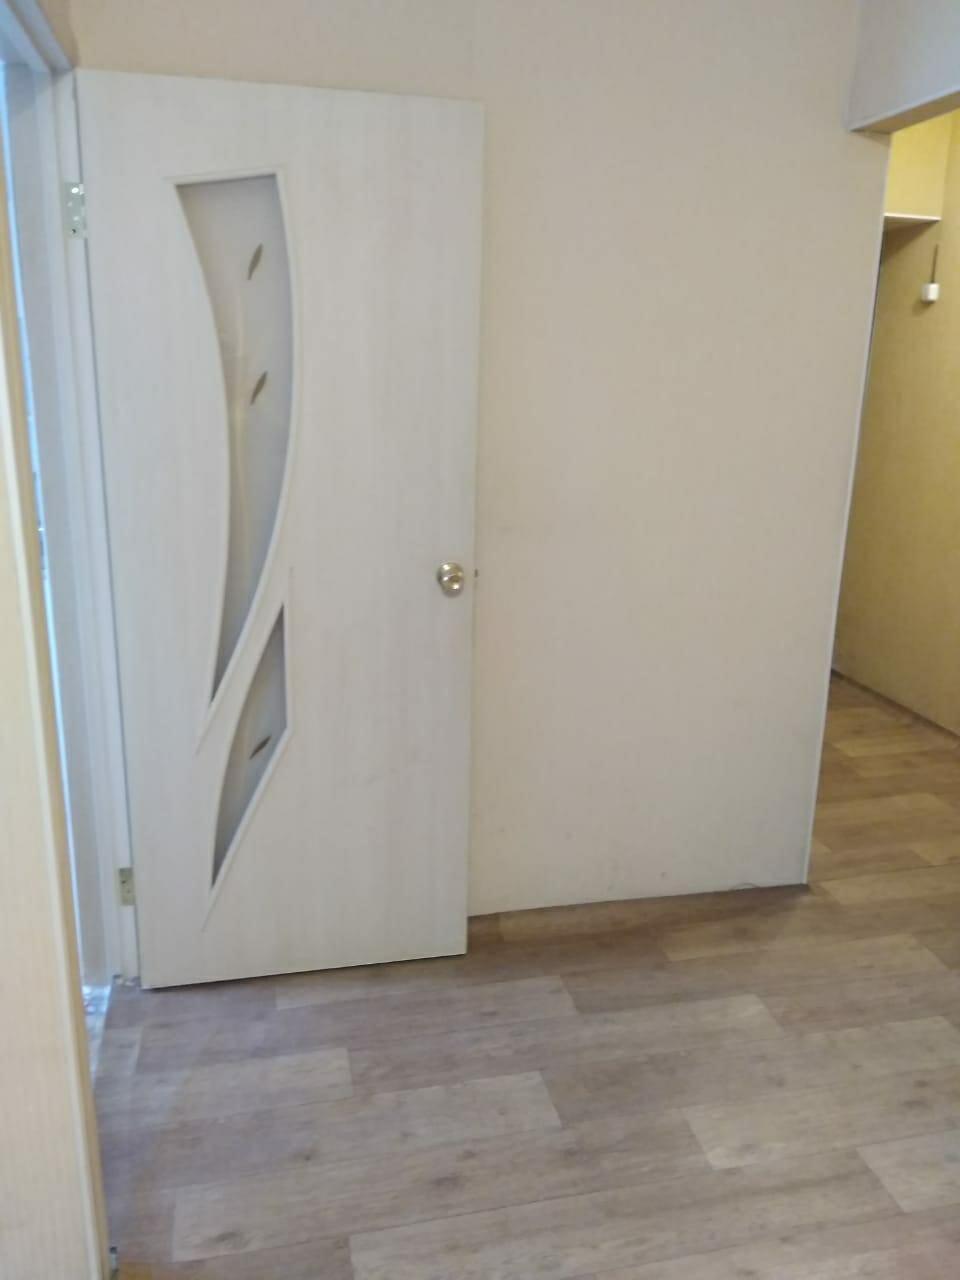 1к квартира улица Красная площадь, 1 | 15000 | аренда в Красноярске фото 7